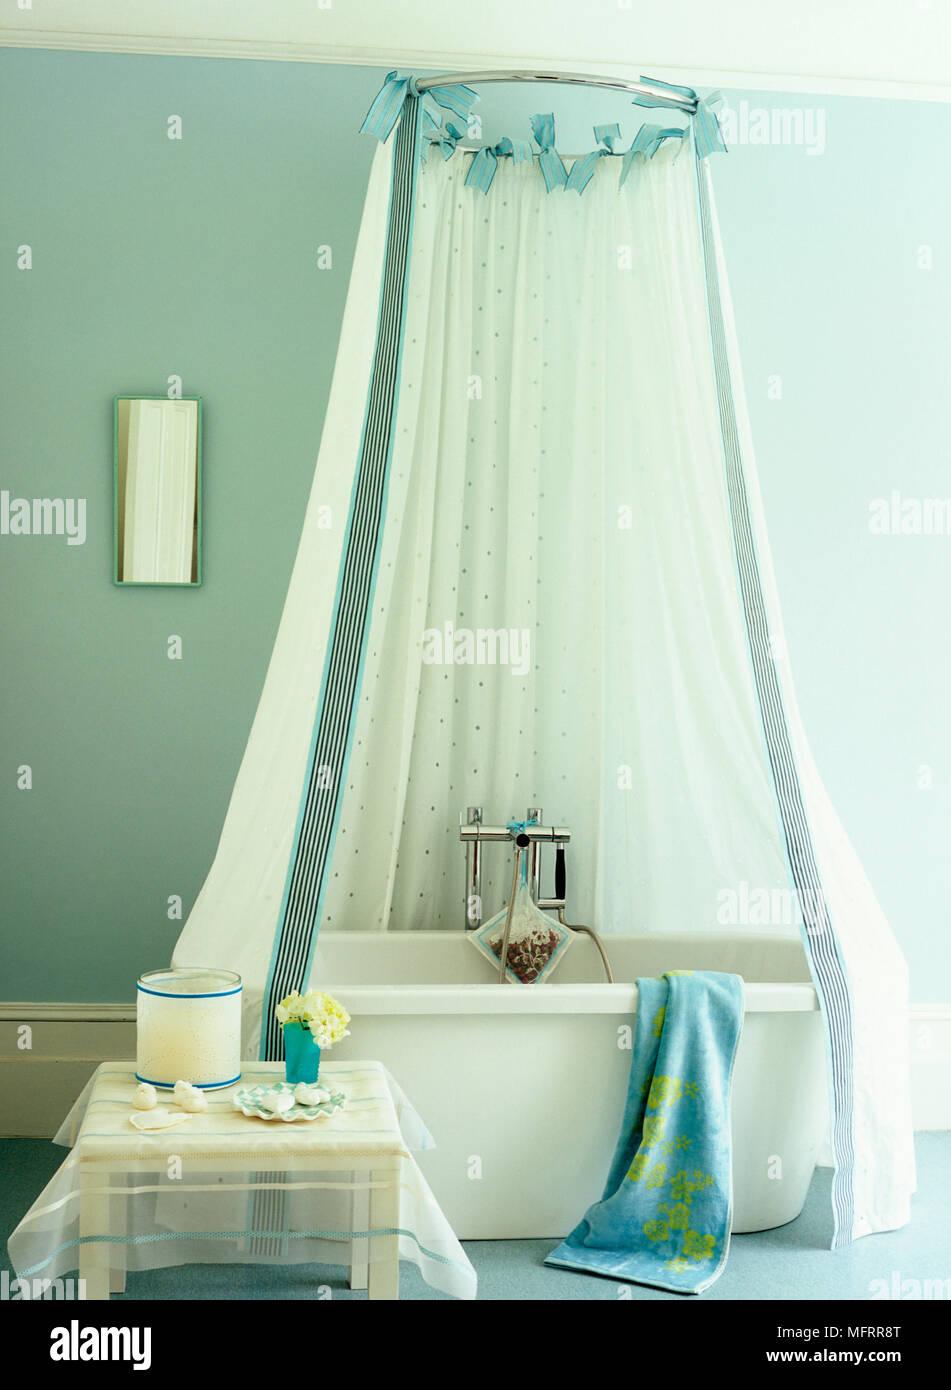 Shower Curtain Above Freestanding Bathtub In Blue Bathroom Stock